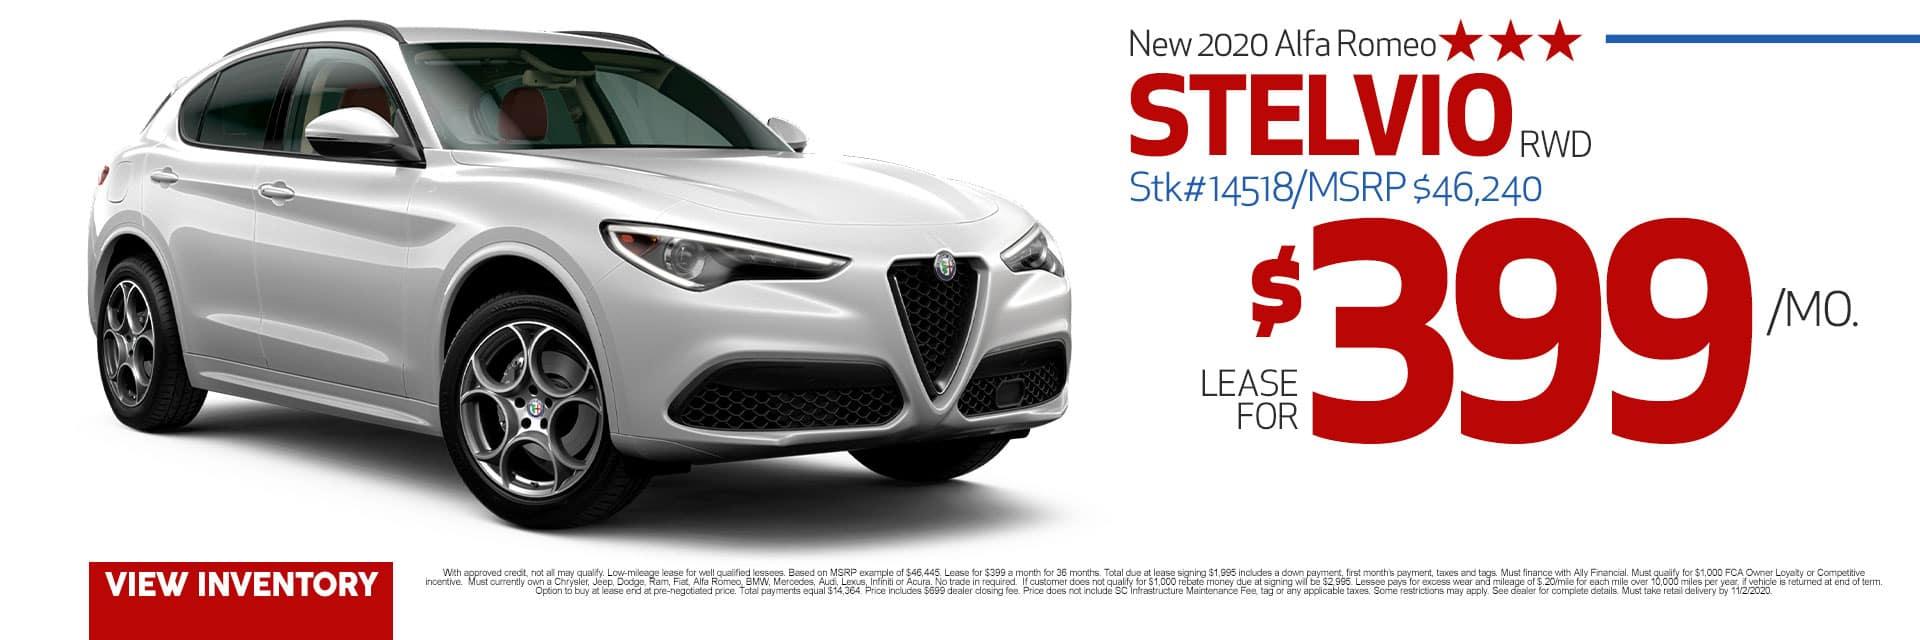 SLAM80451-01-October-2020-Web-Campaign-Alfa-Romeo-Slides-stelvio UPDATED